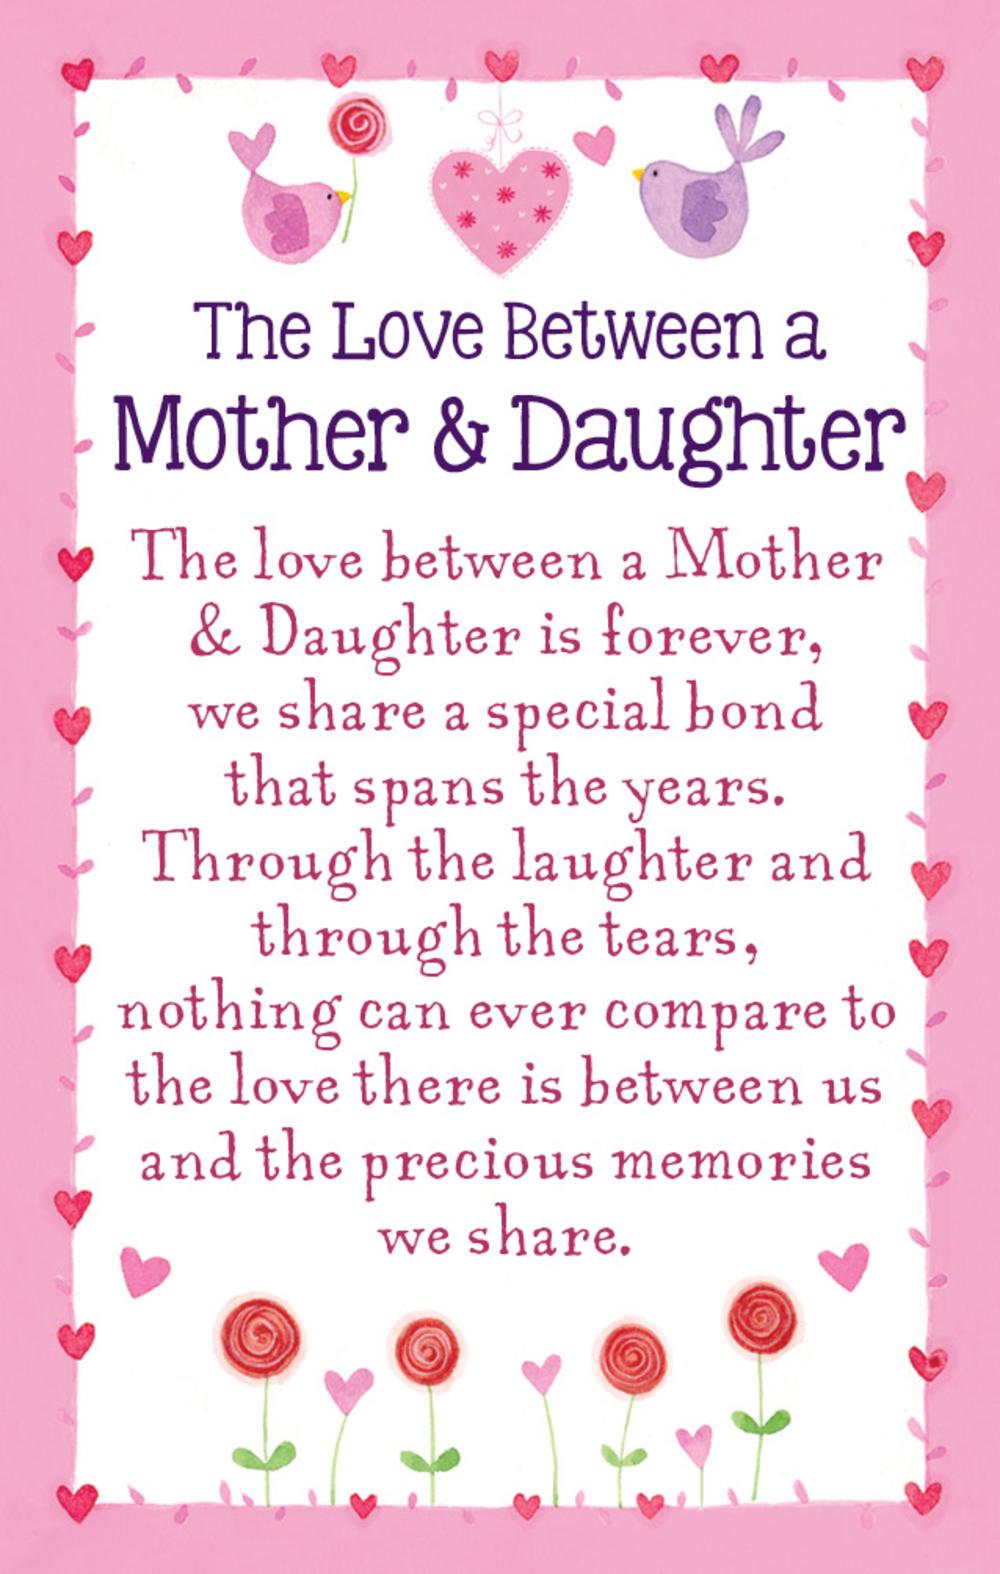 Mother & Daughter Love Heartwarmers Keepsake Credit Card & Envelope